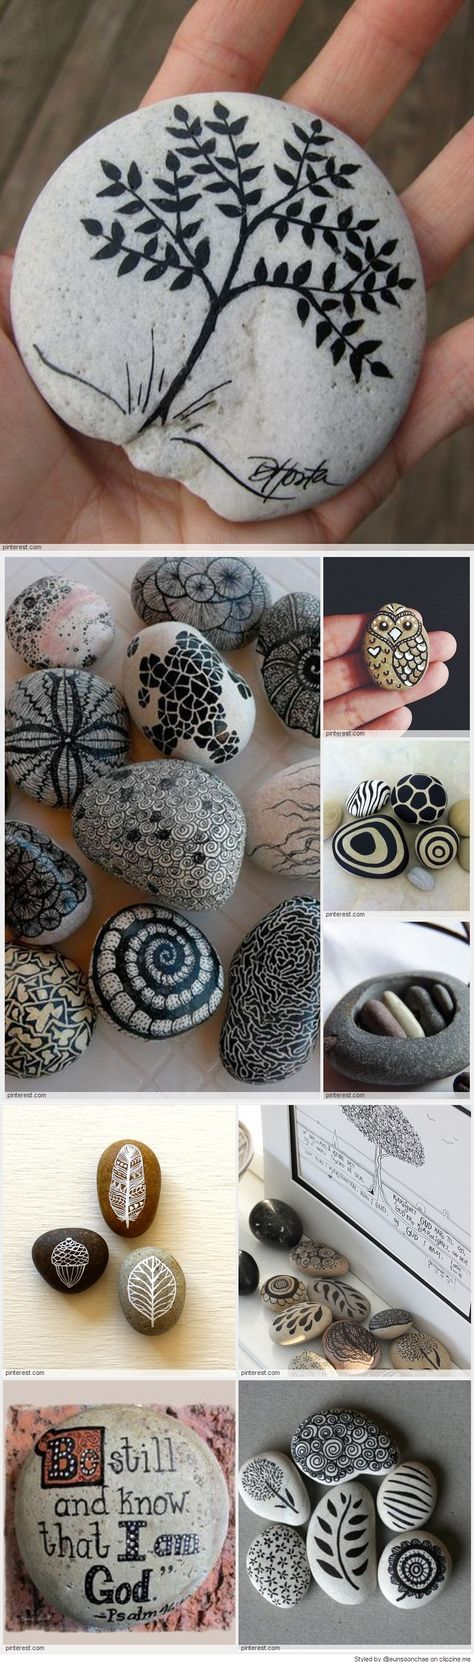 diy rock painting ideas9